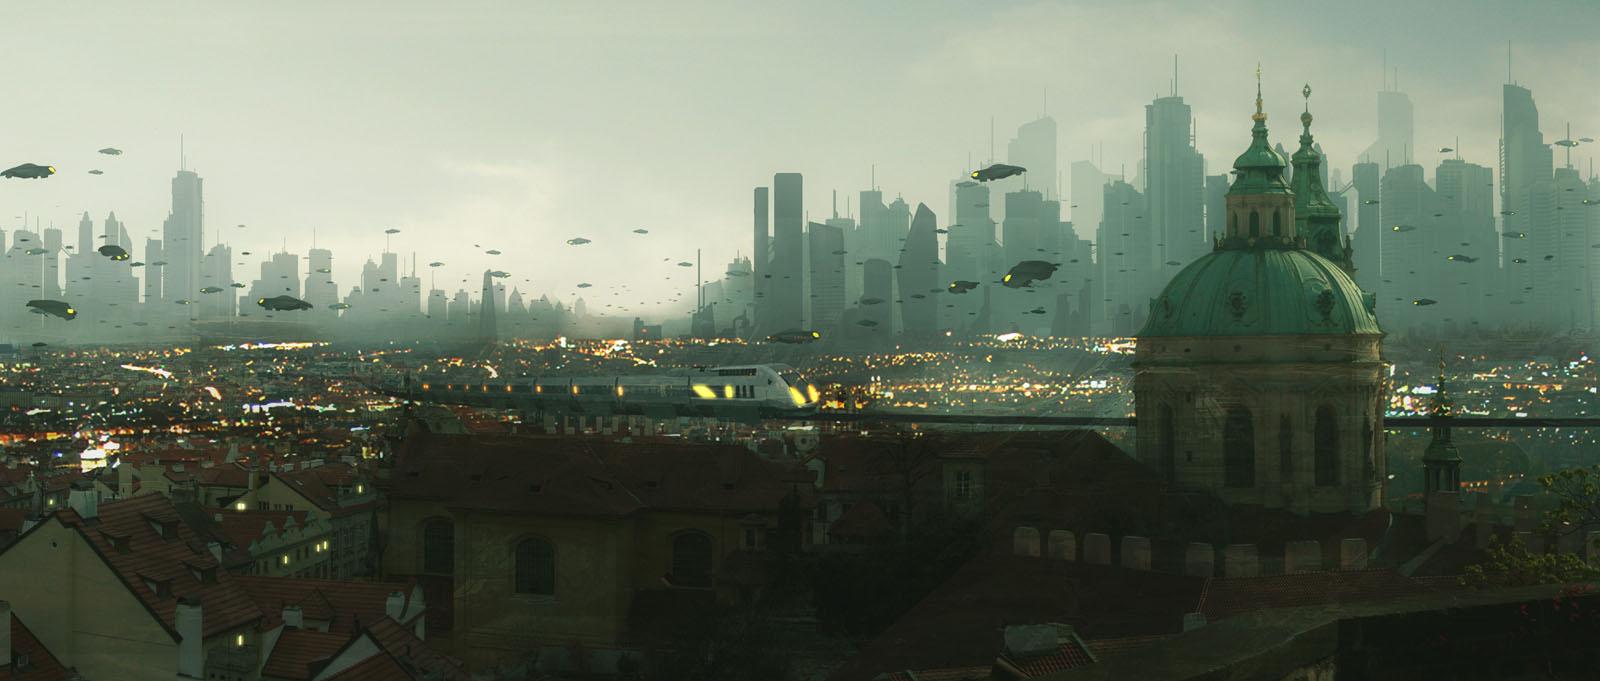 2B_City02